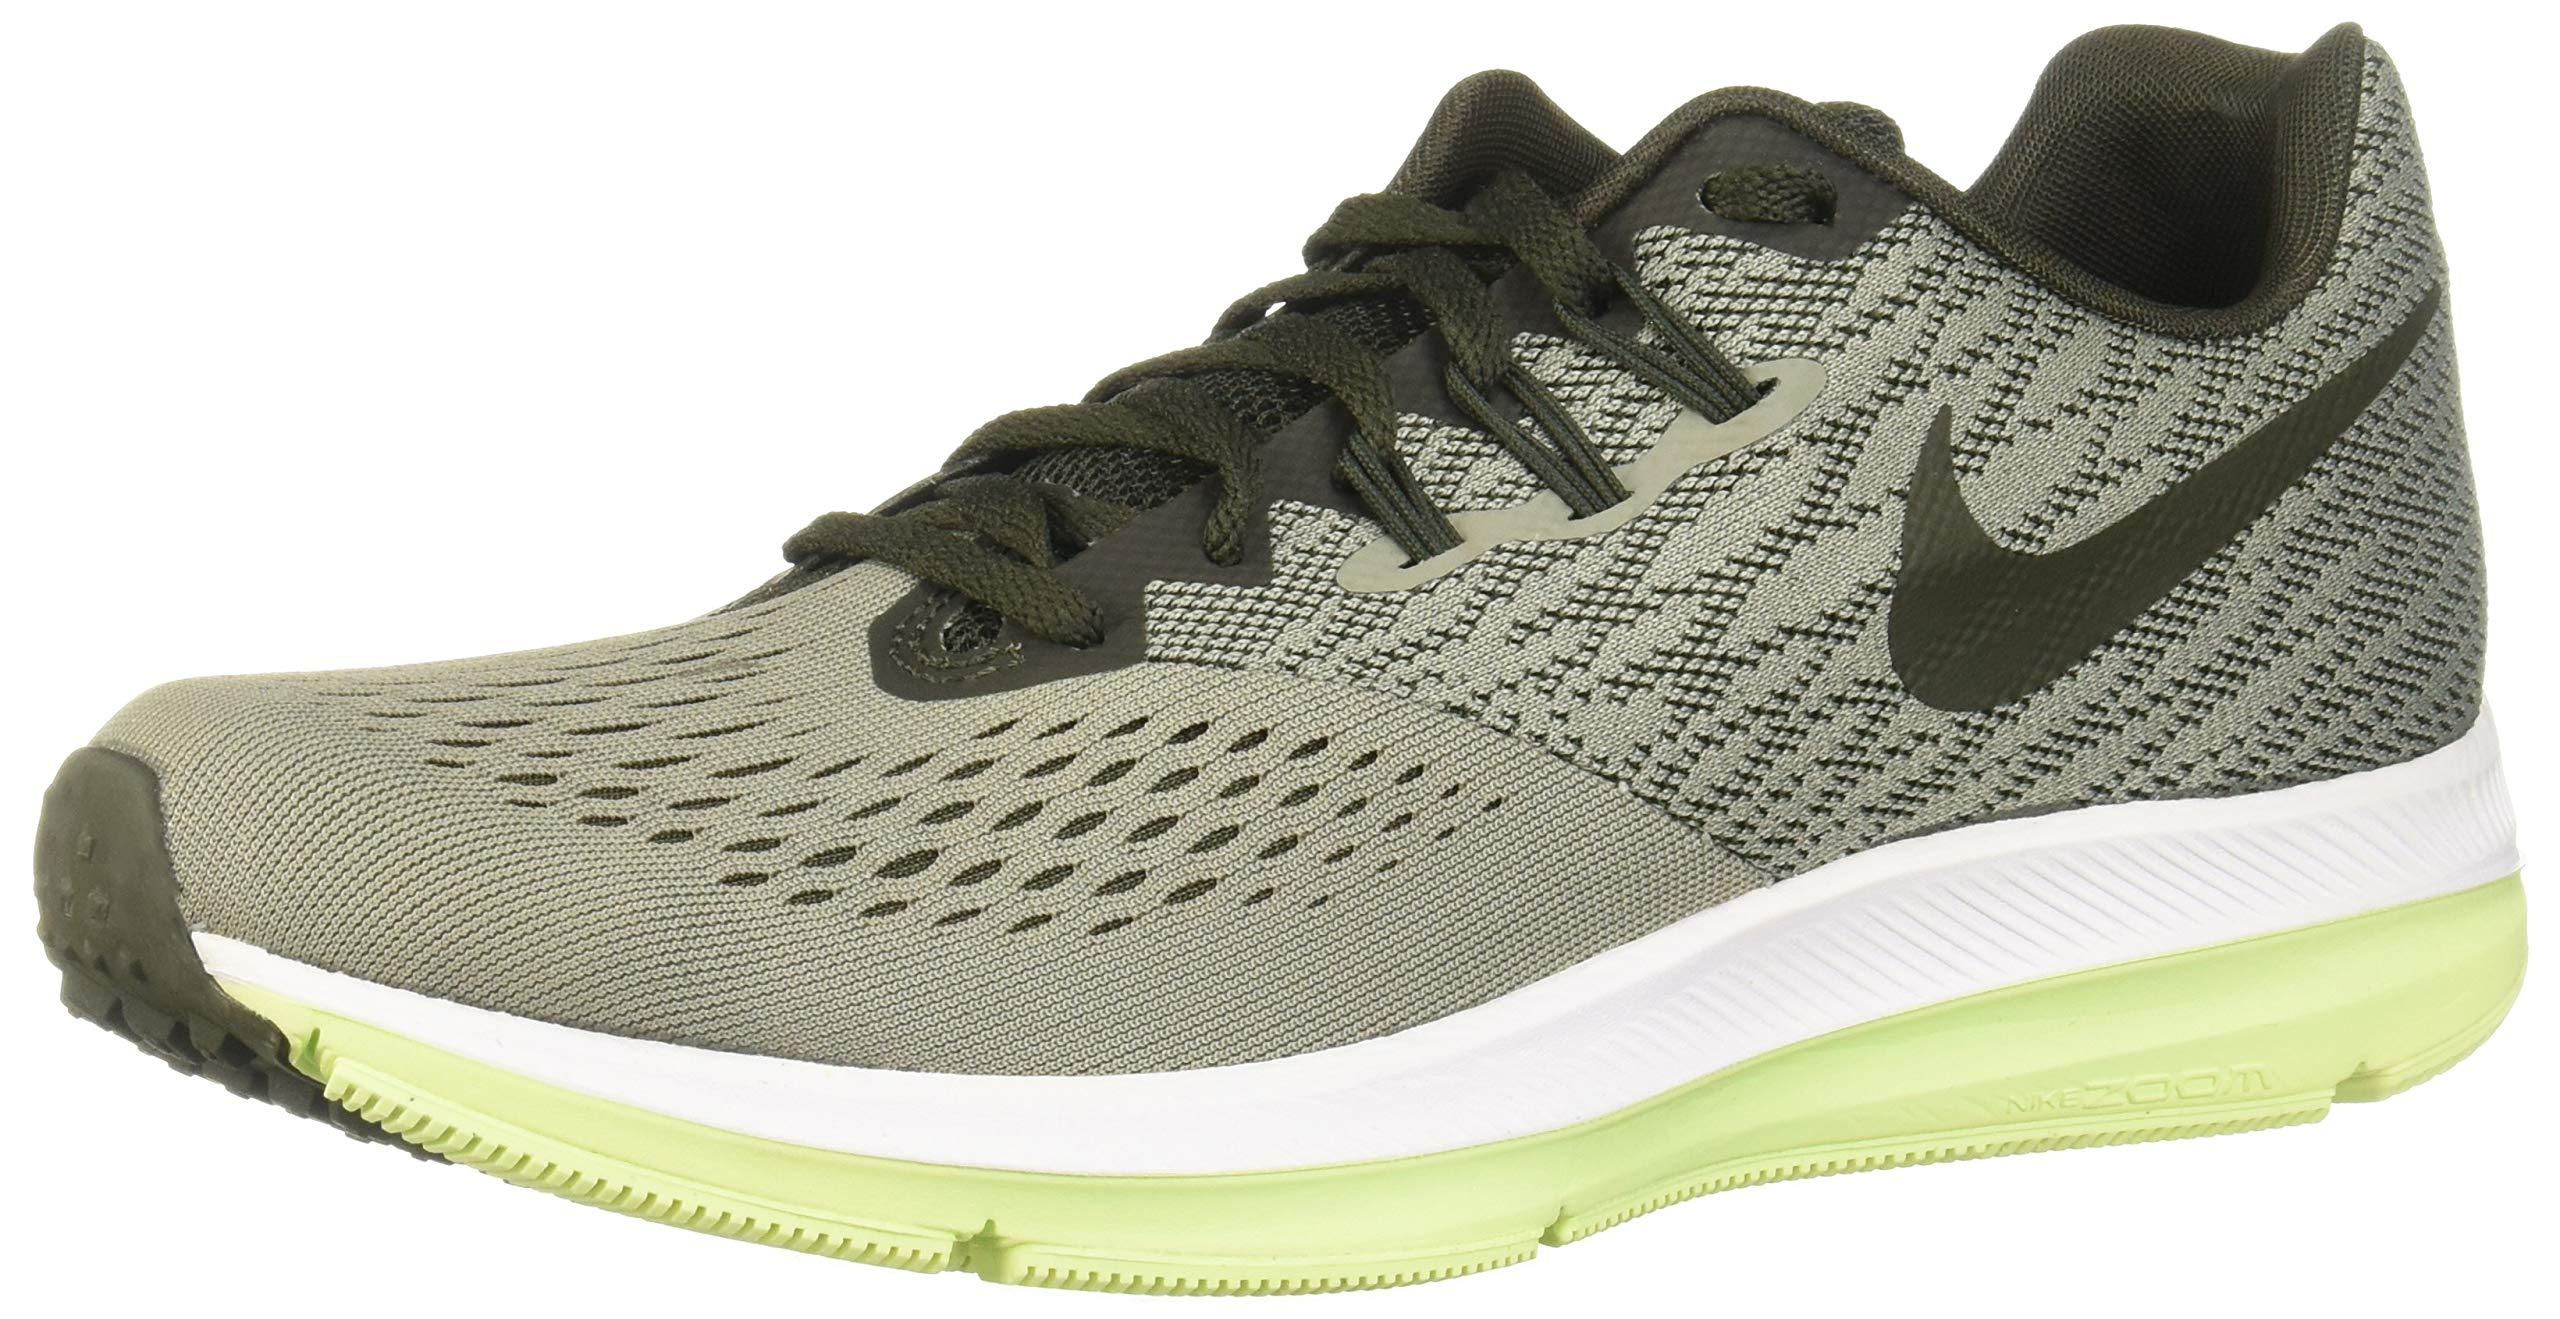 sports shoes b3eab c2dd4 Nike Men's Air Zoom Winflo 4 Running Shoe (11, Dark Stucco/Sequoia-Barely  Volt-White)